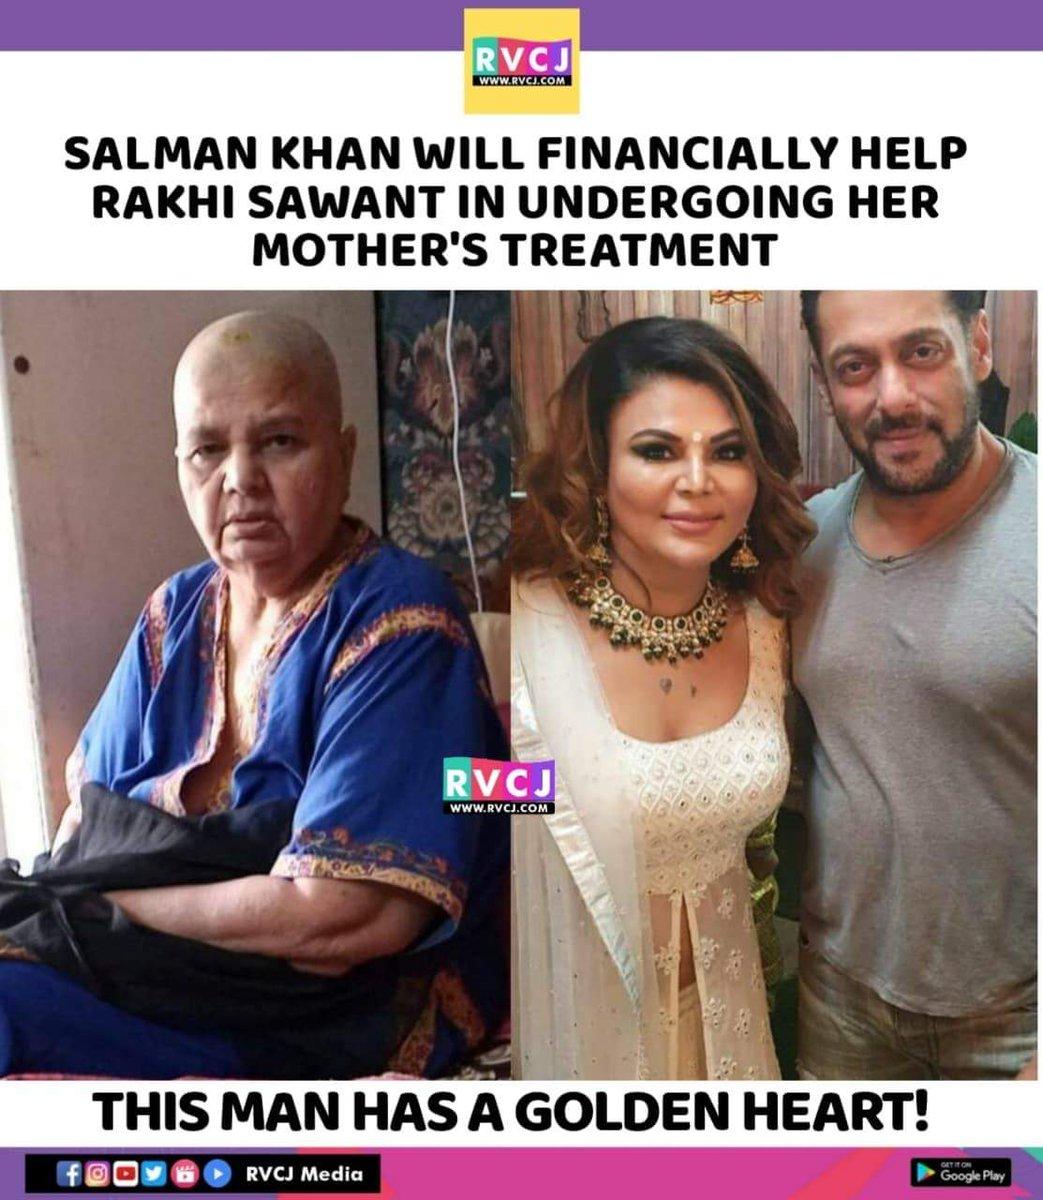 man with golden heart  bhagwaan paisa aur shohoraat deta b ussi ko hai jo usko jaruraat mando ko dena janta hai #RakhiSawant #SalmanOnIPML #IPMLonZeeTV    IPML PREMIER WITH SALMAN